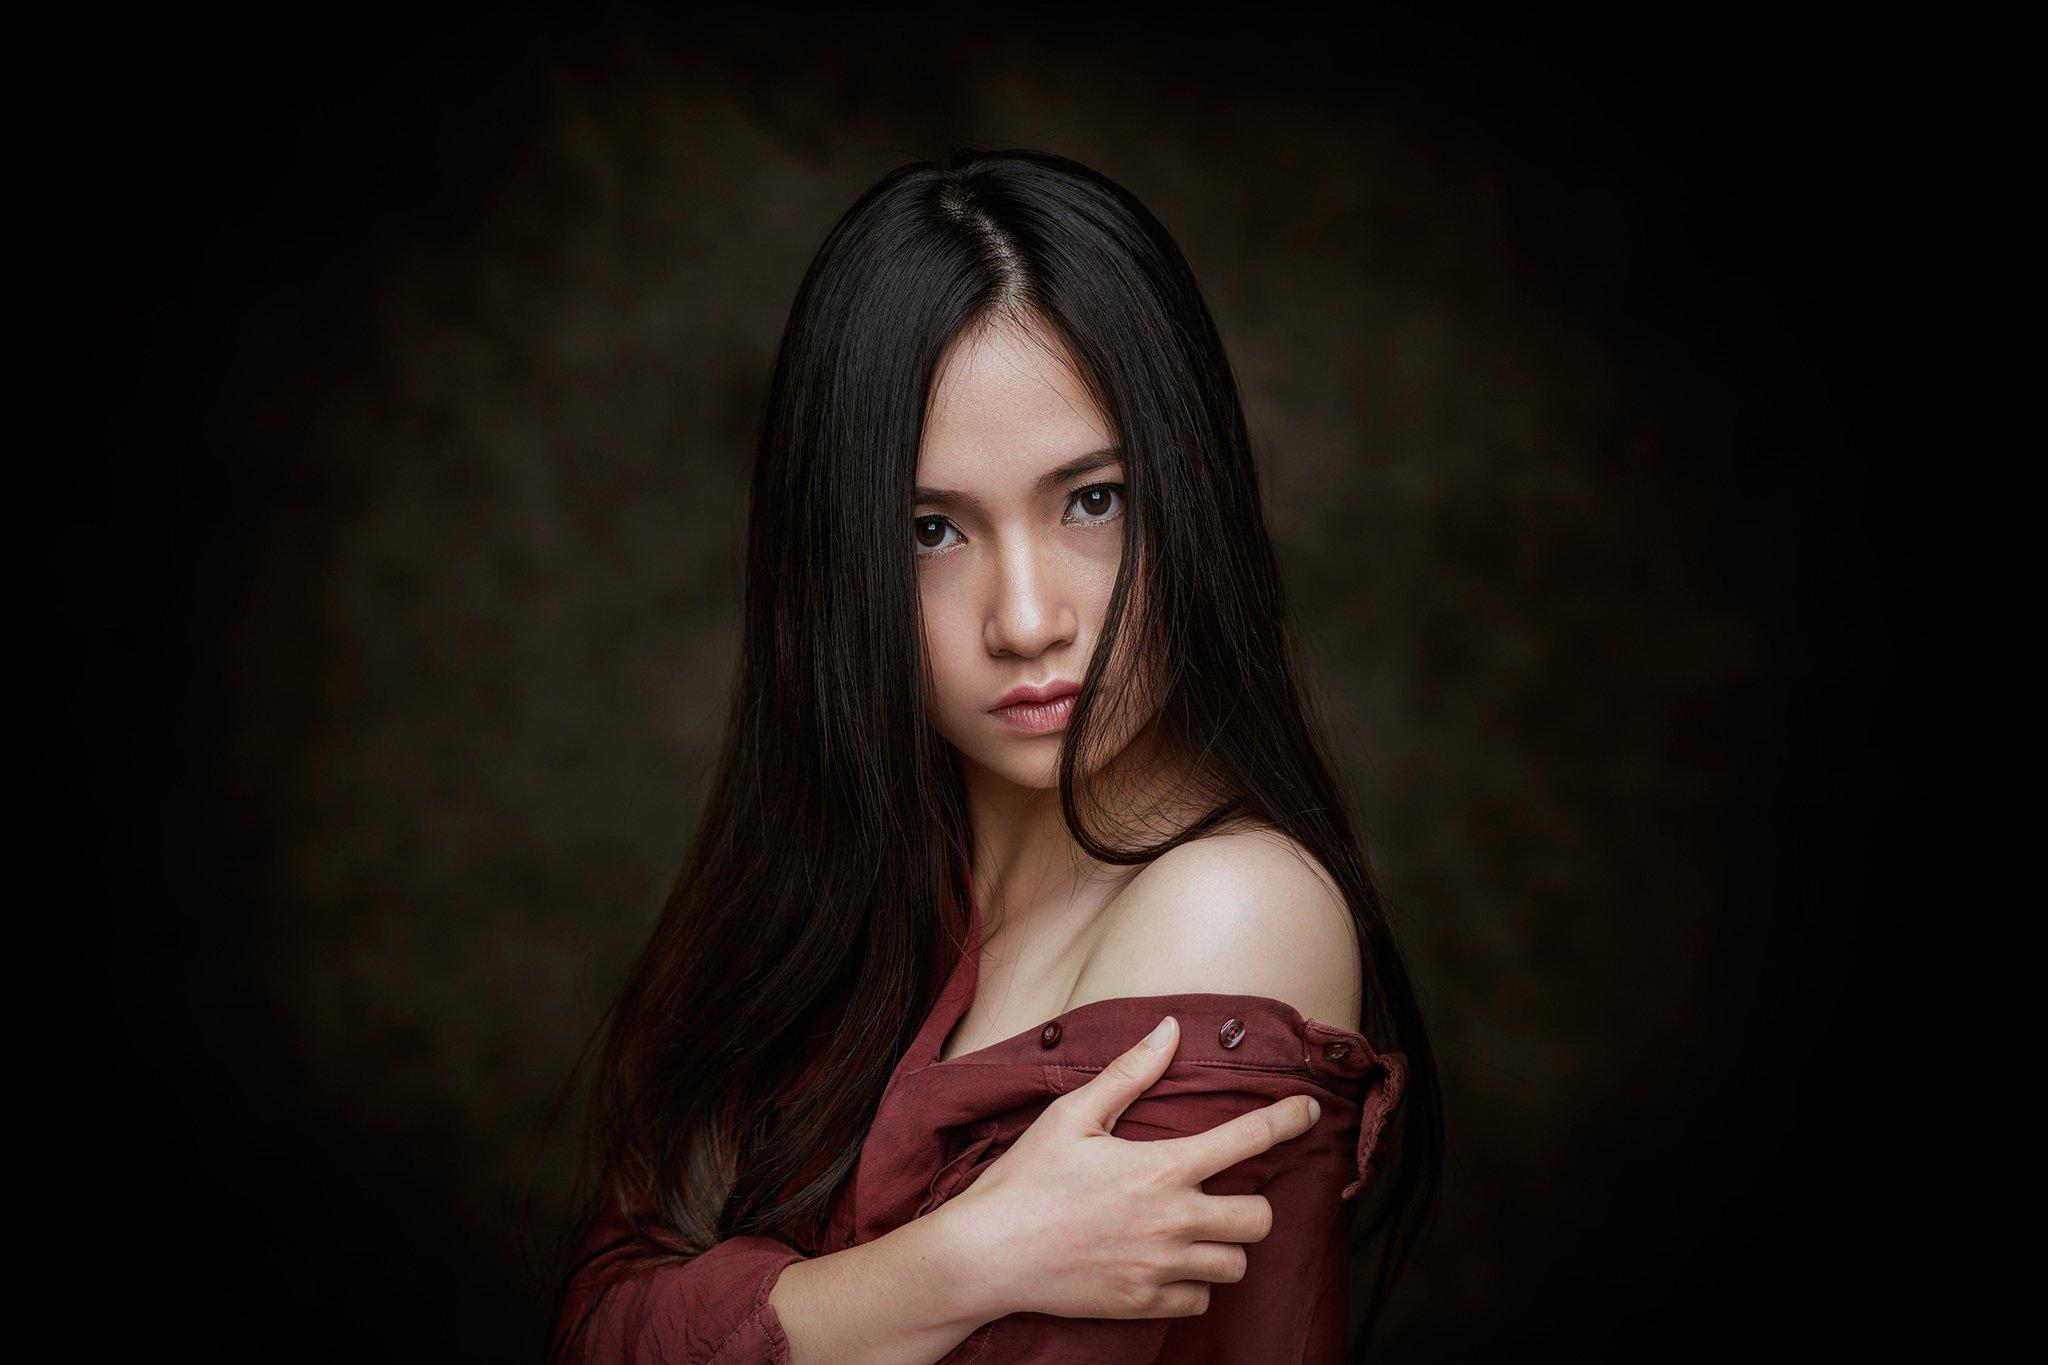 portrait, face, girl, asian, vietnam, vietnamese, eyes, longhair, young, Hoang Viet Nguyen